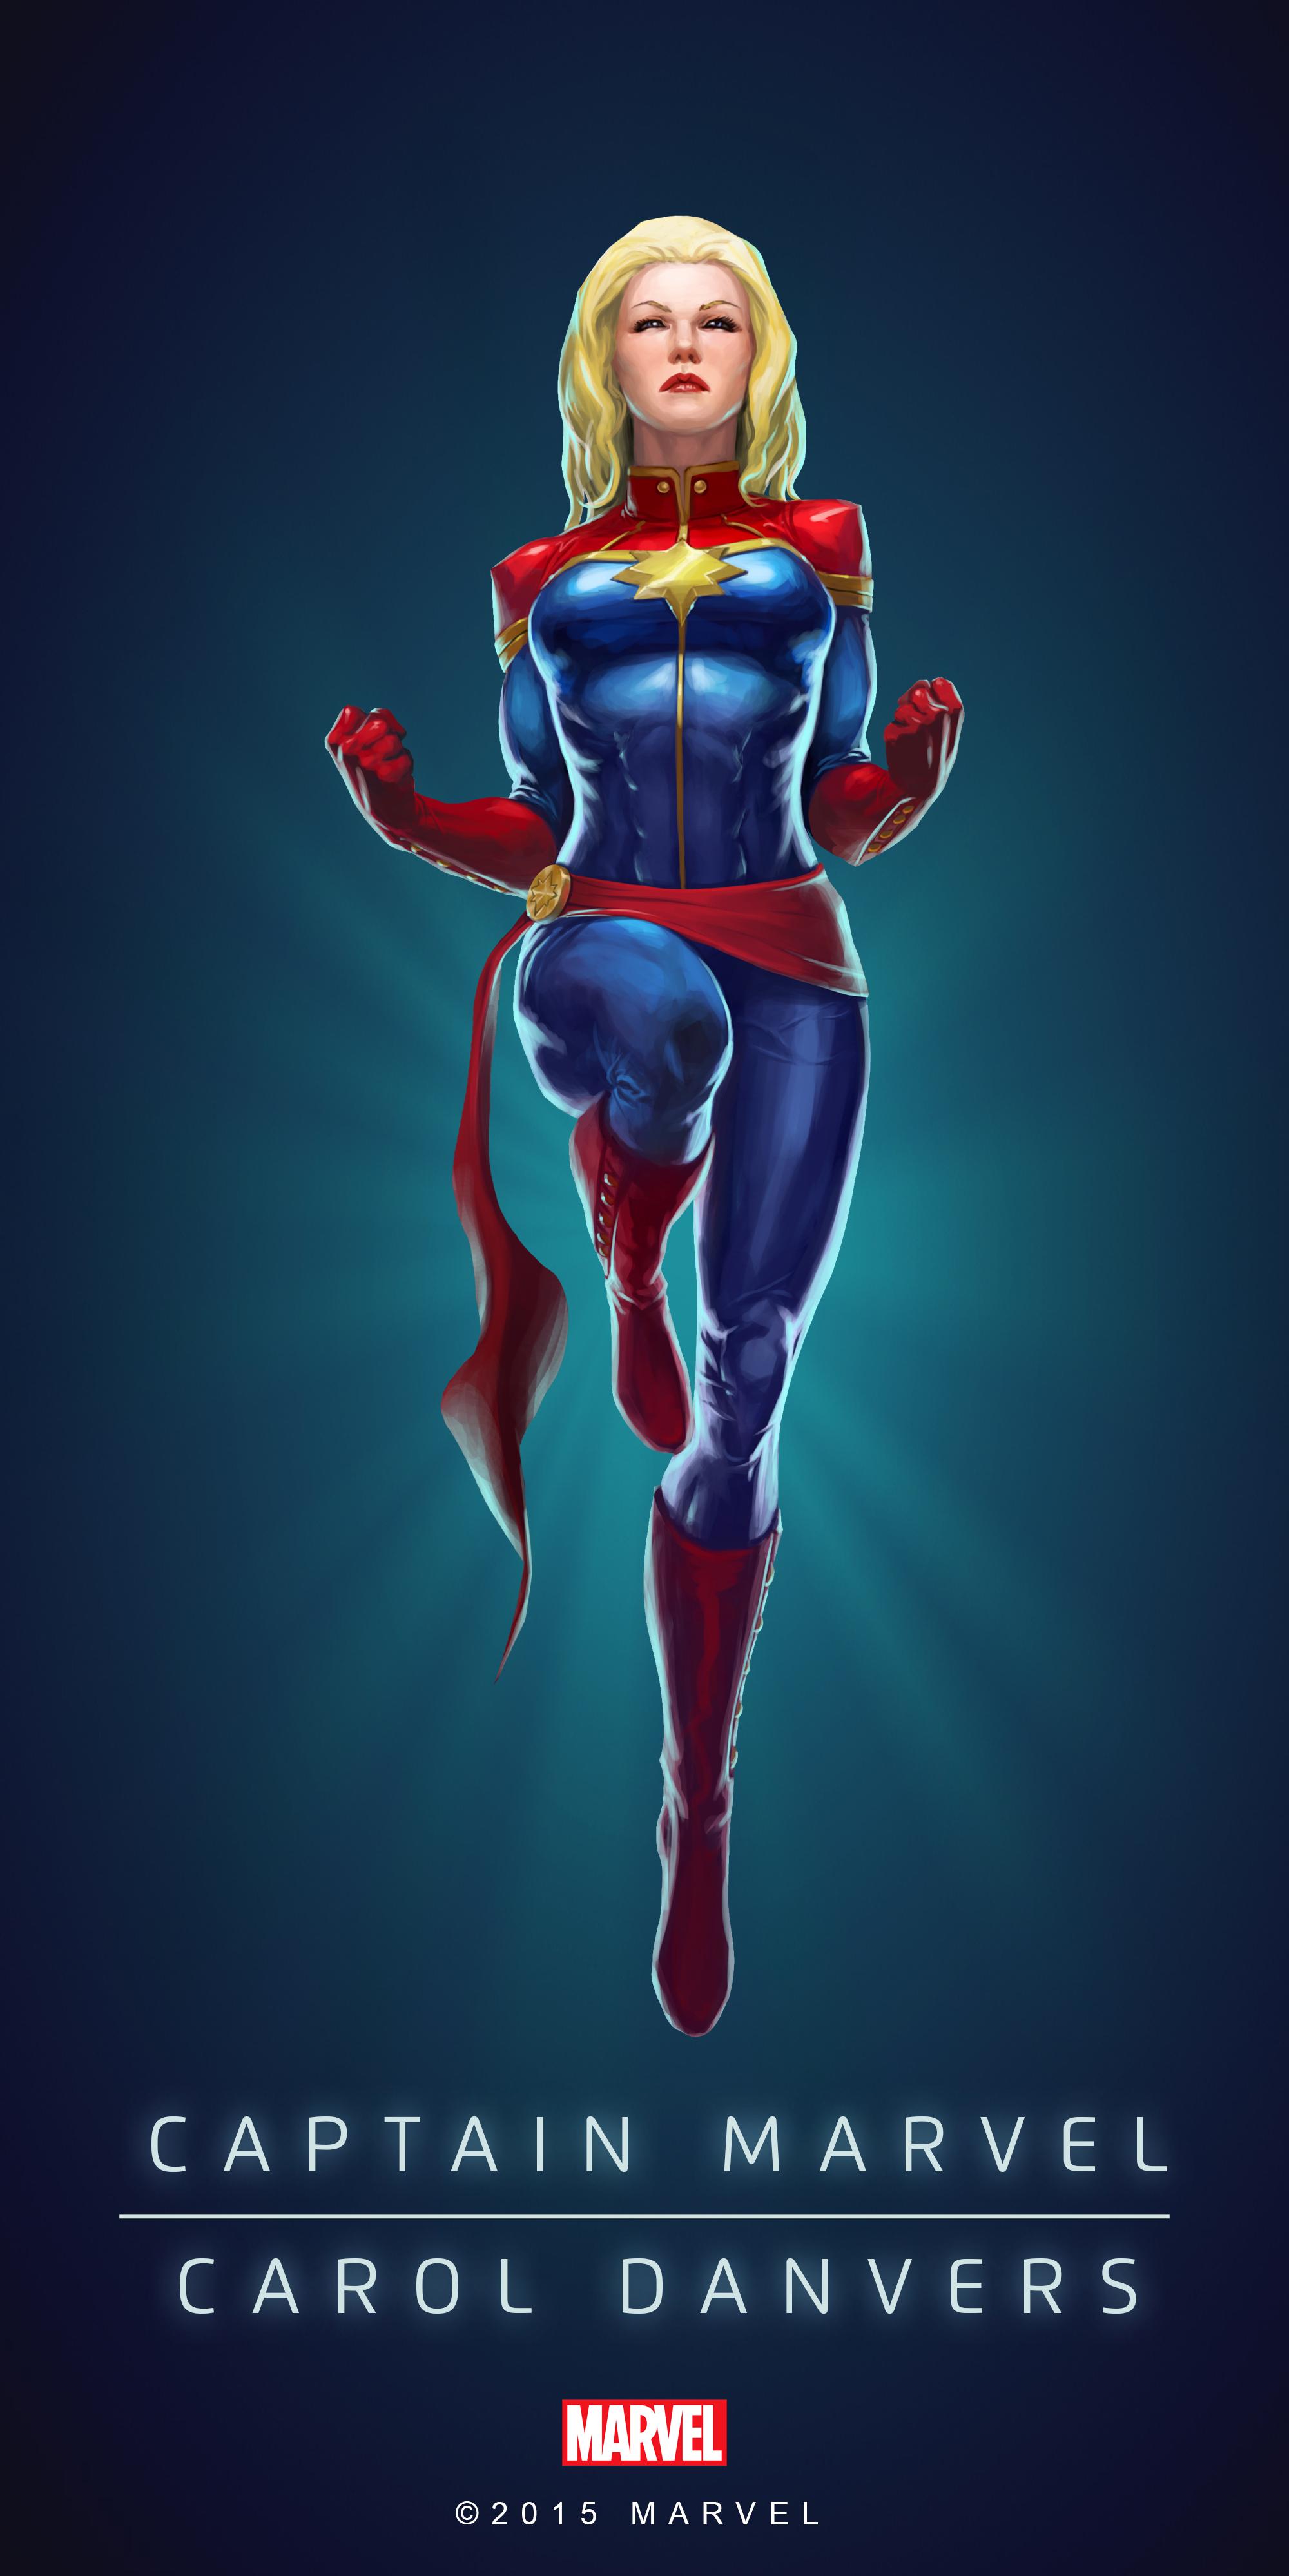 Carol Danvers Captain Marvel Poster 03 Png 2000 3997 Marvel Comic Character Ms Marvel Marvel Superheroes